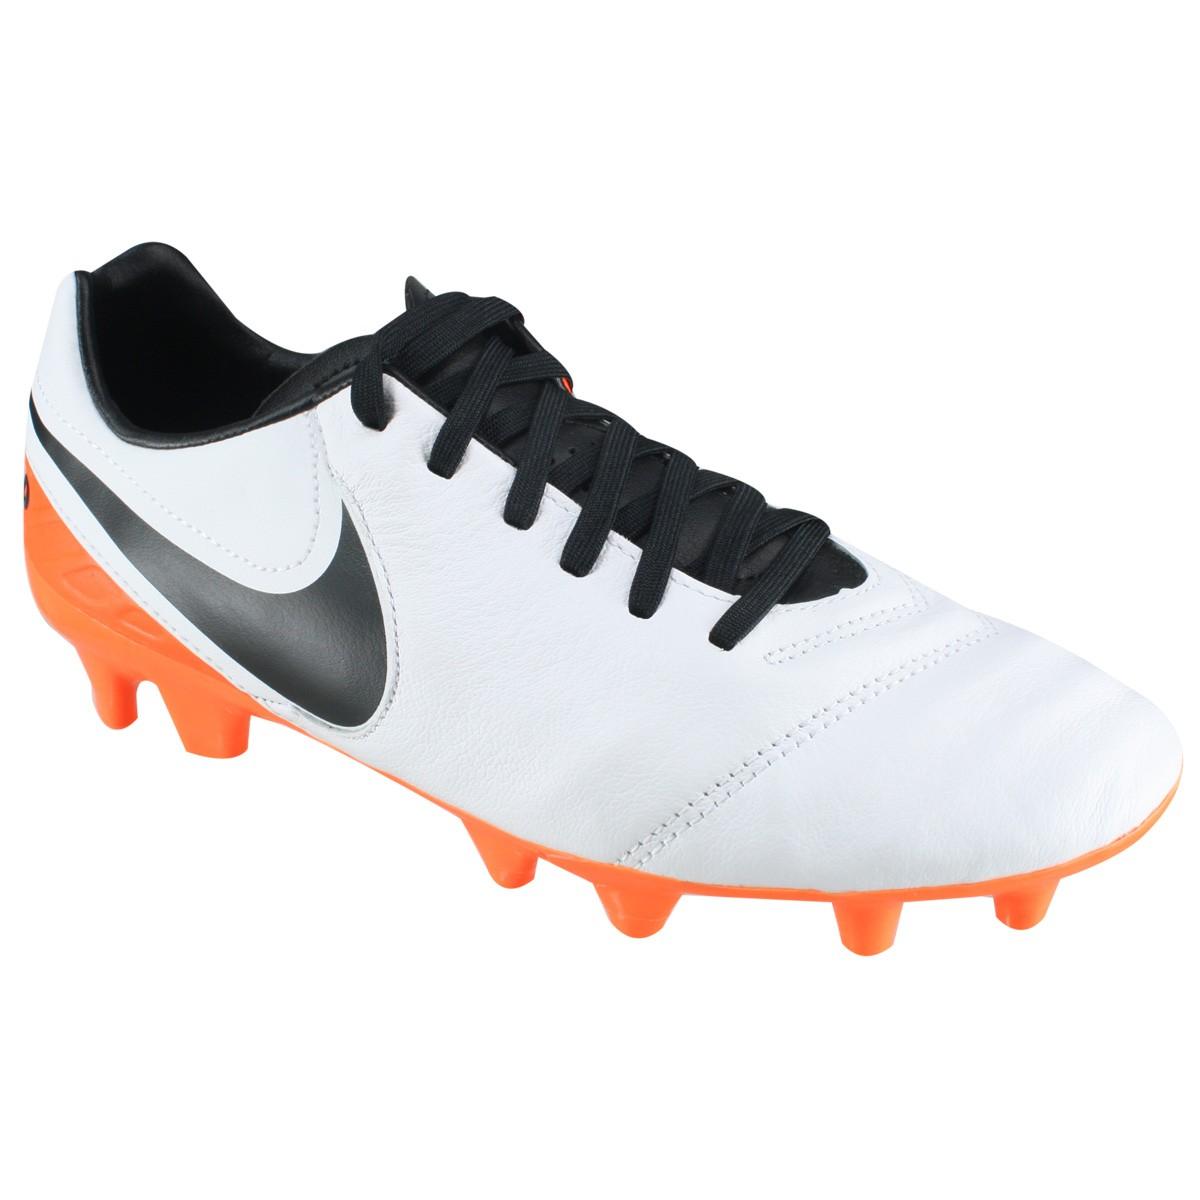 promo code 2dc7a 1206c ... Chuteira Nike Campo Tiempo Mystic V FG. Passe ...